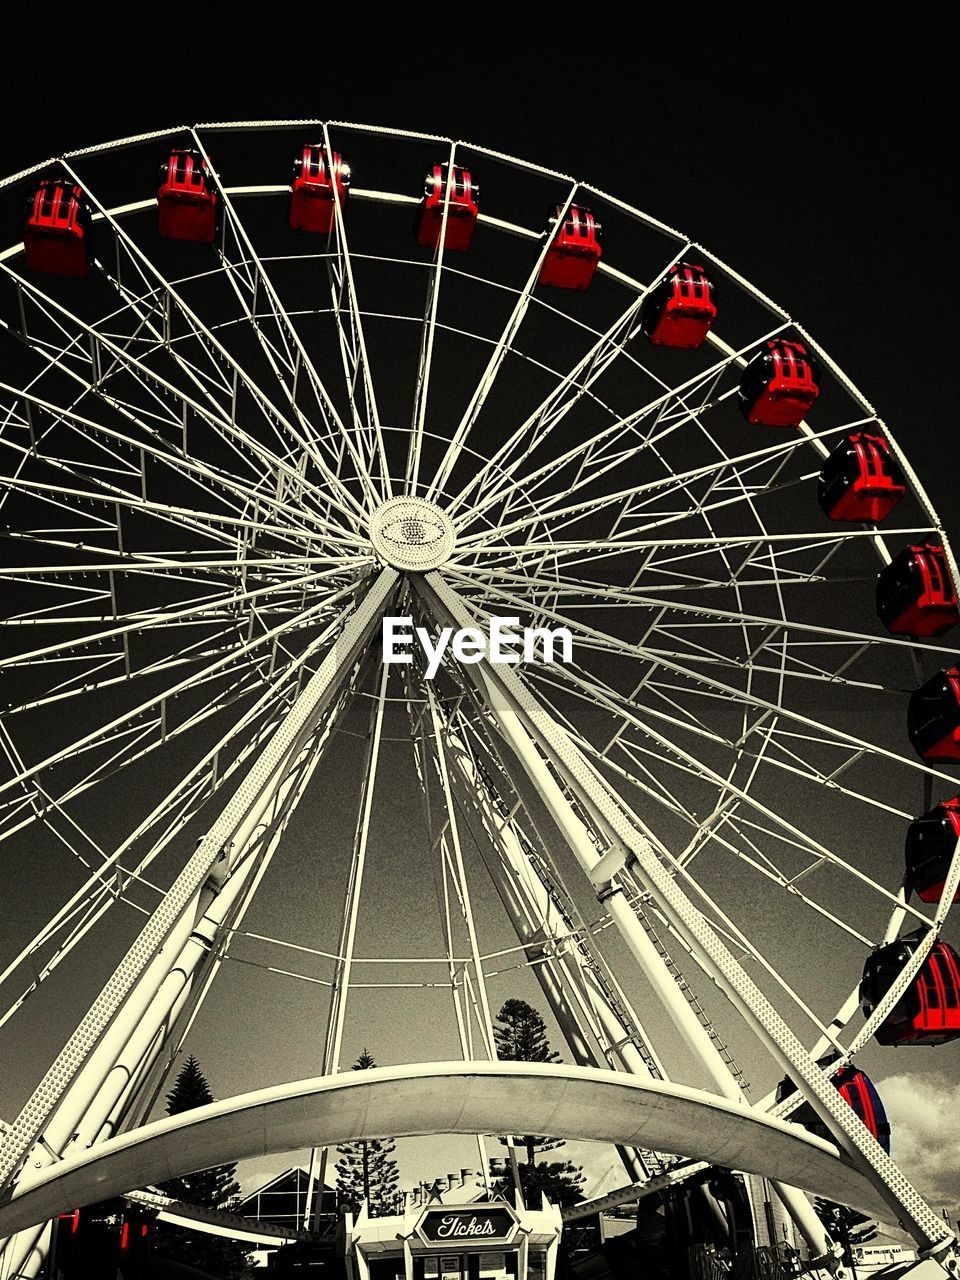 amusement park, arts culture and entertainment, ferris wheel, low angle view, no people, amusement park ride, night, outdoors, big wheel, sky, illuminated